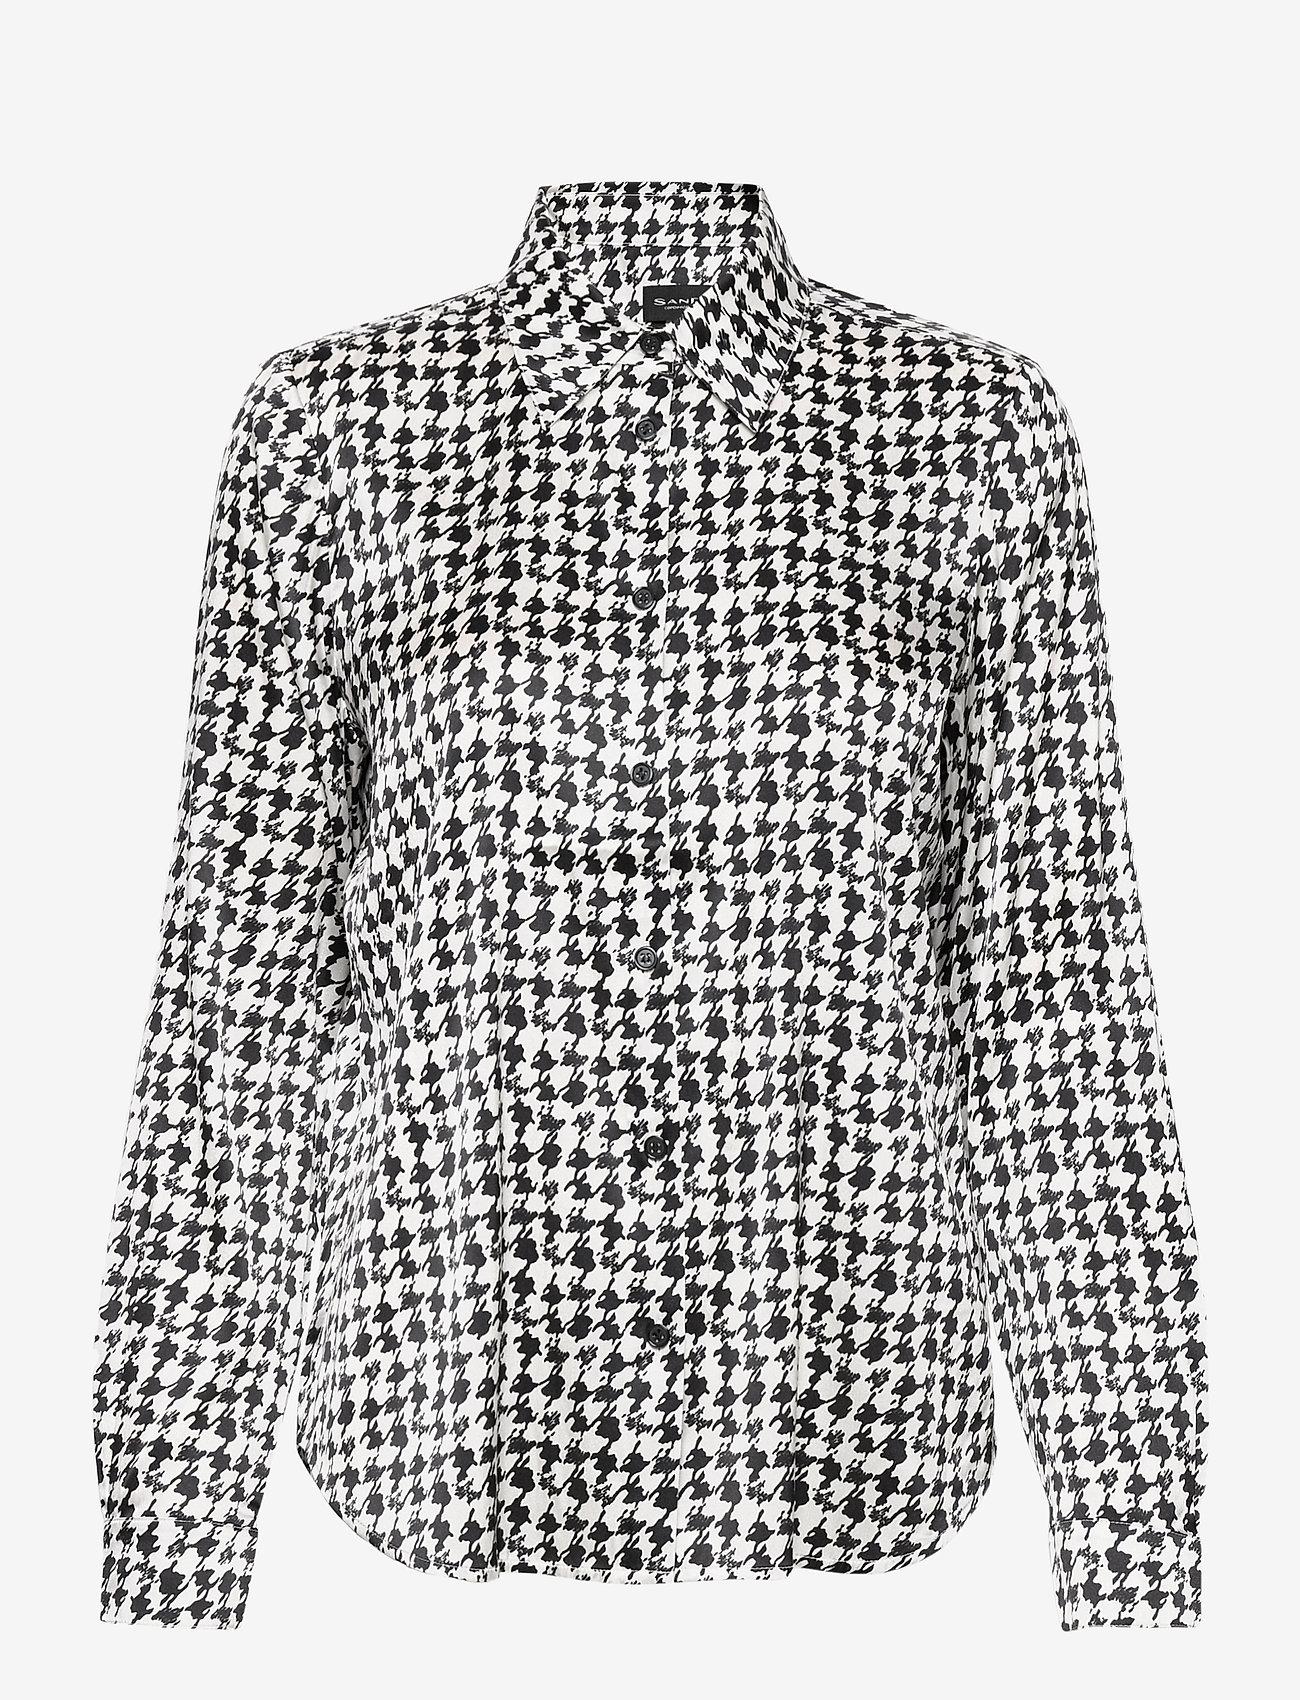 SAND - 3174 Satin - Latia - long sleeved blouses - pattern - 0